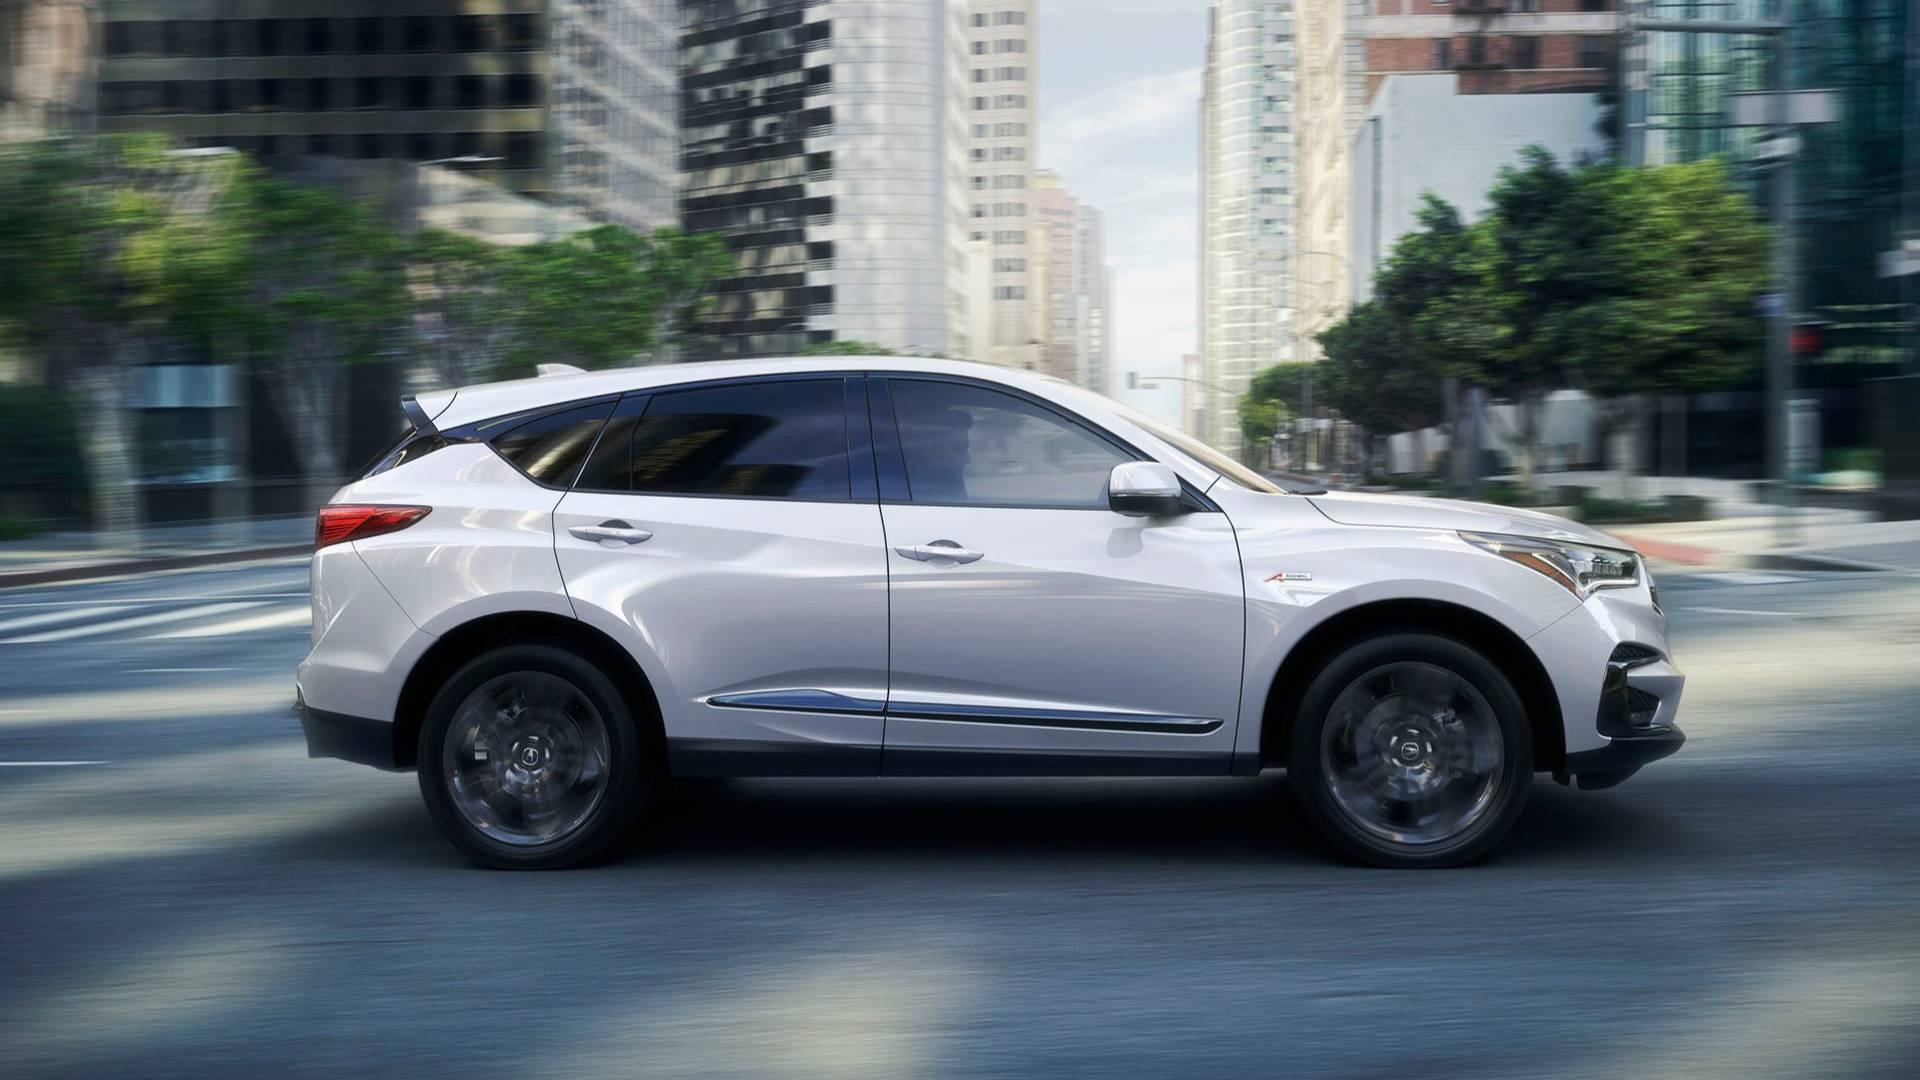 Toyota Suv 2019 >> 2019-acura-rdx (14)   Auta a motorky z Japonska